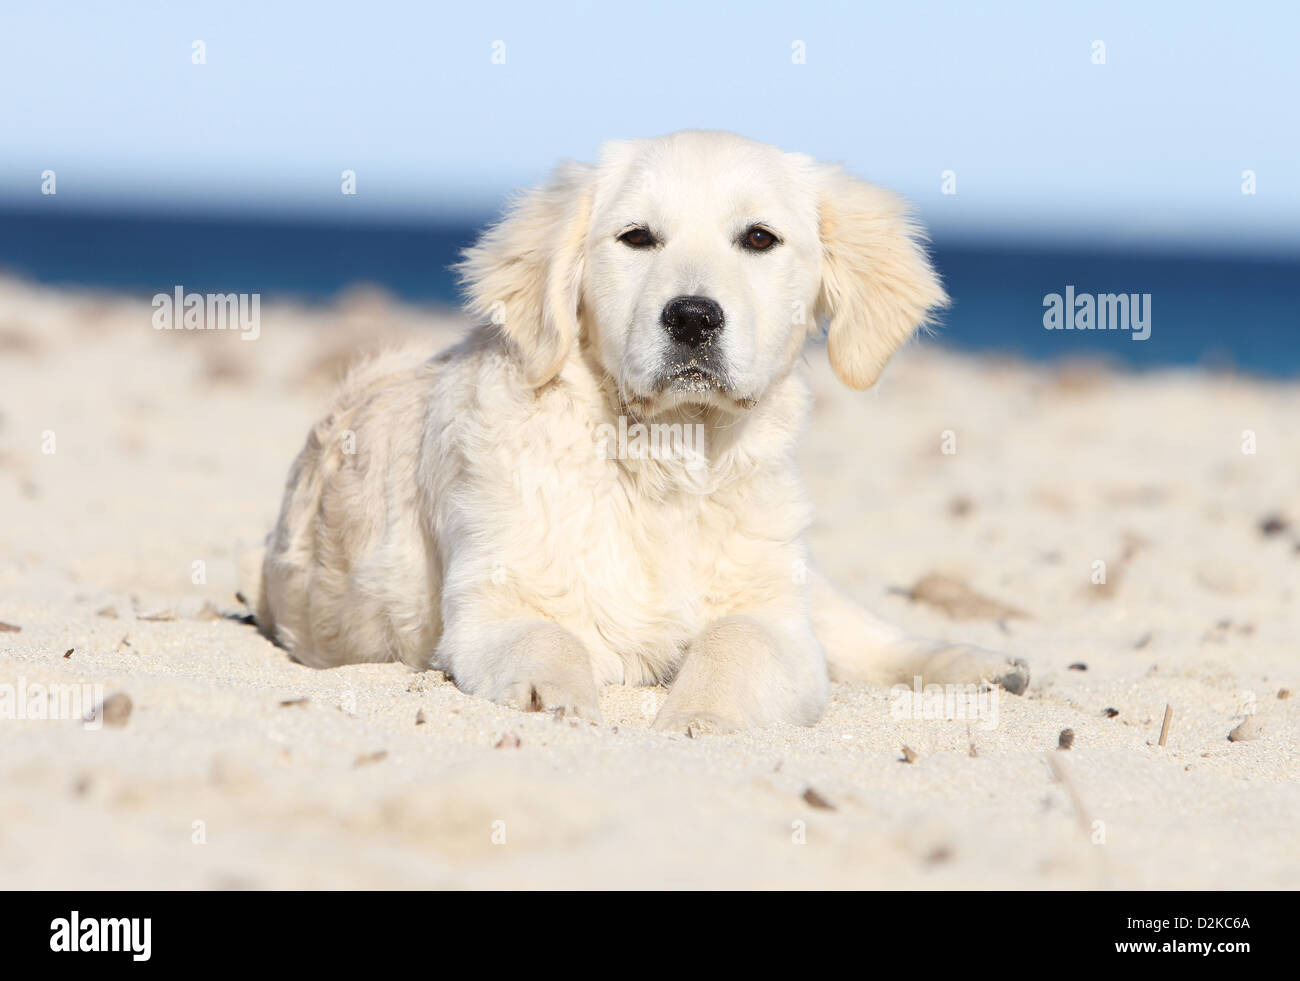 Dog Golden Retriever Puppy Lying On The Beach Stock Photo Alamy